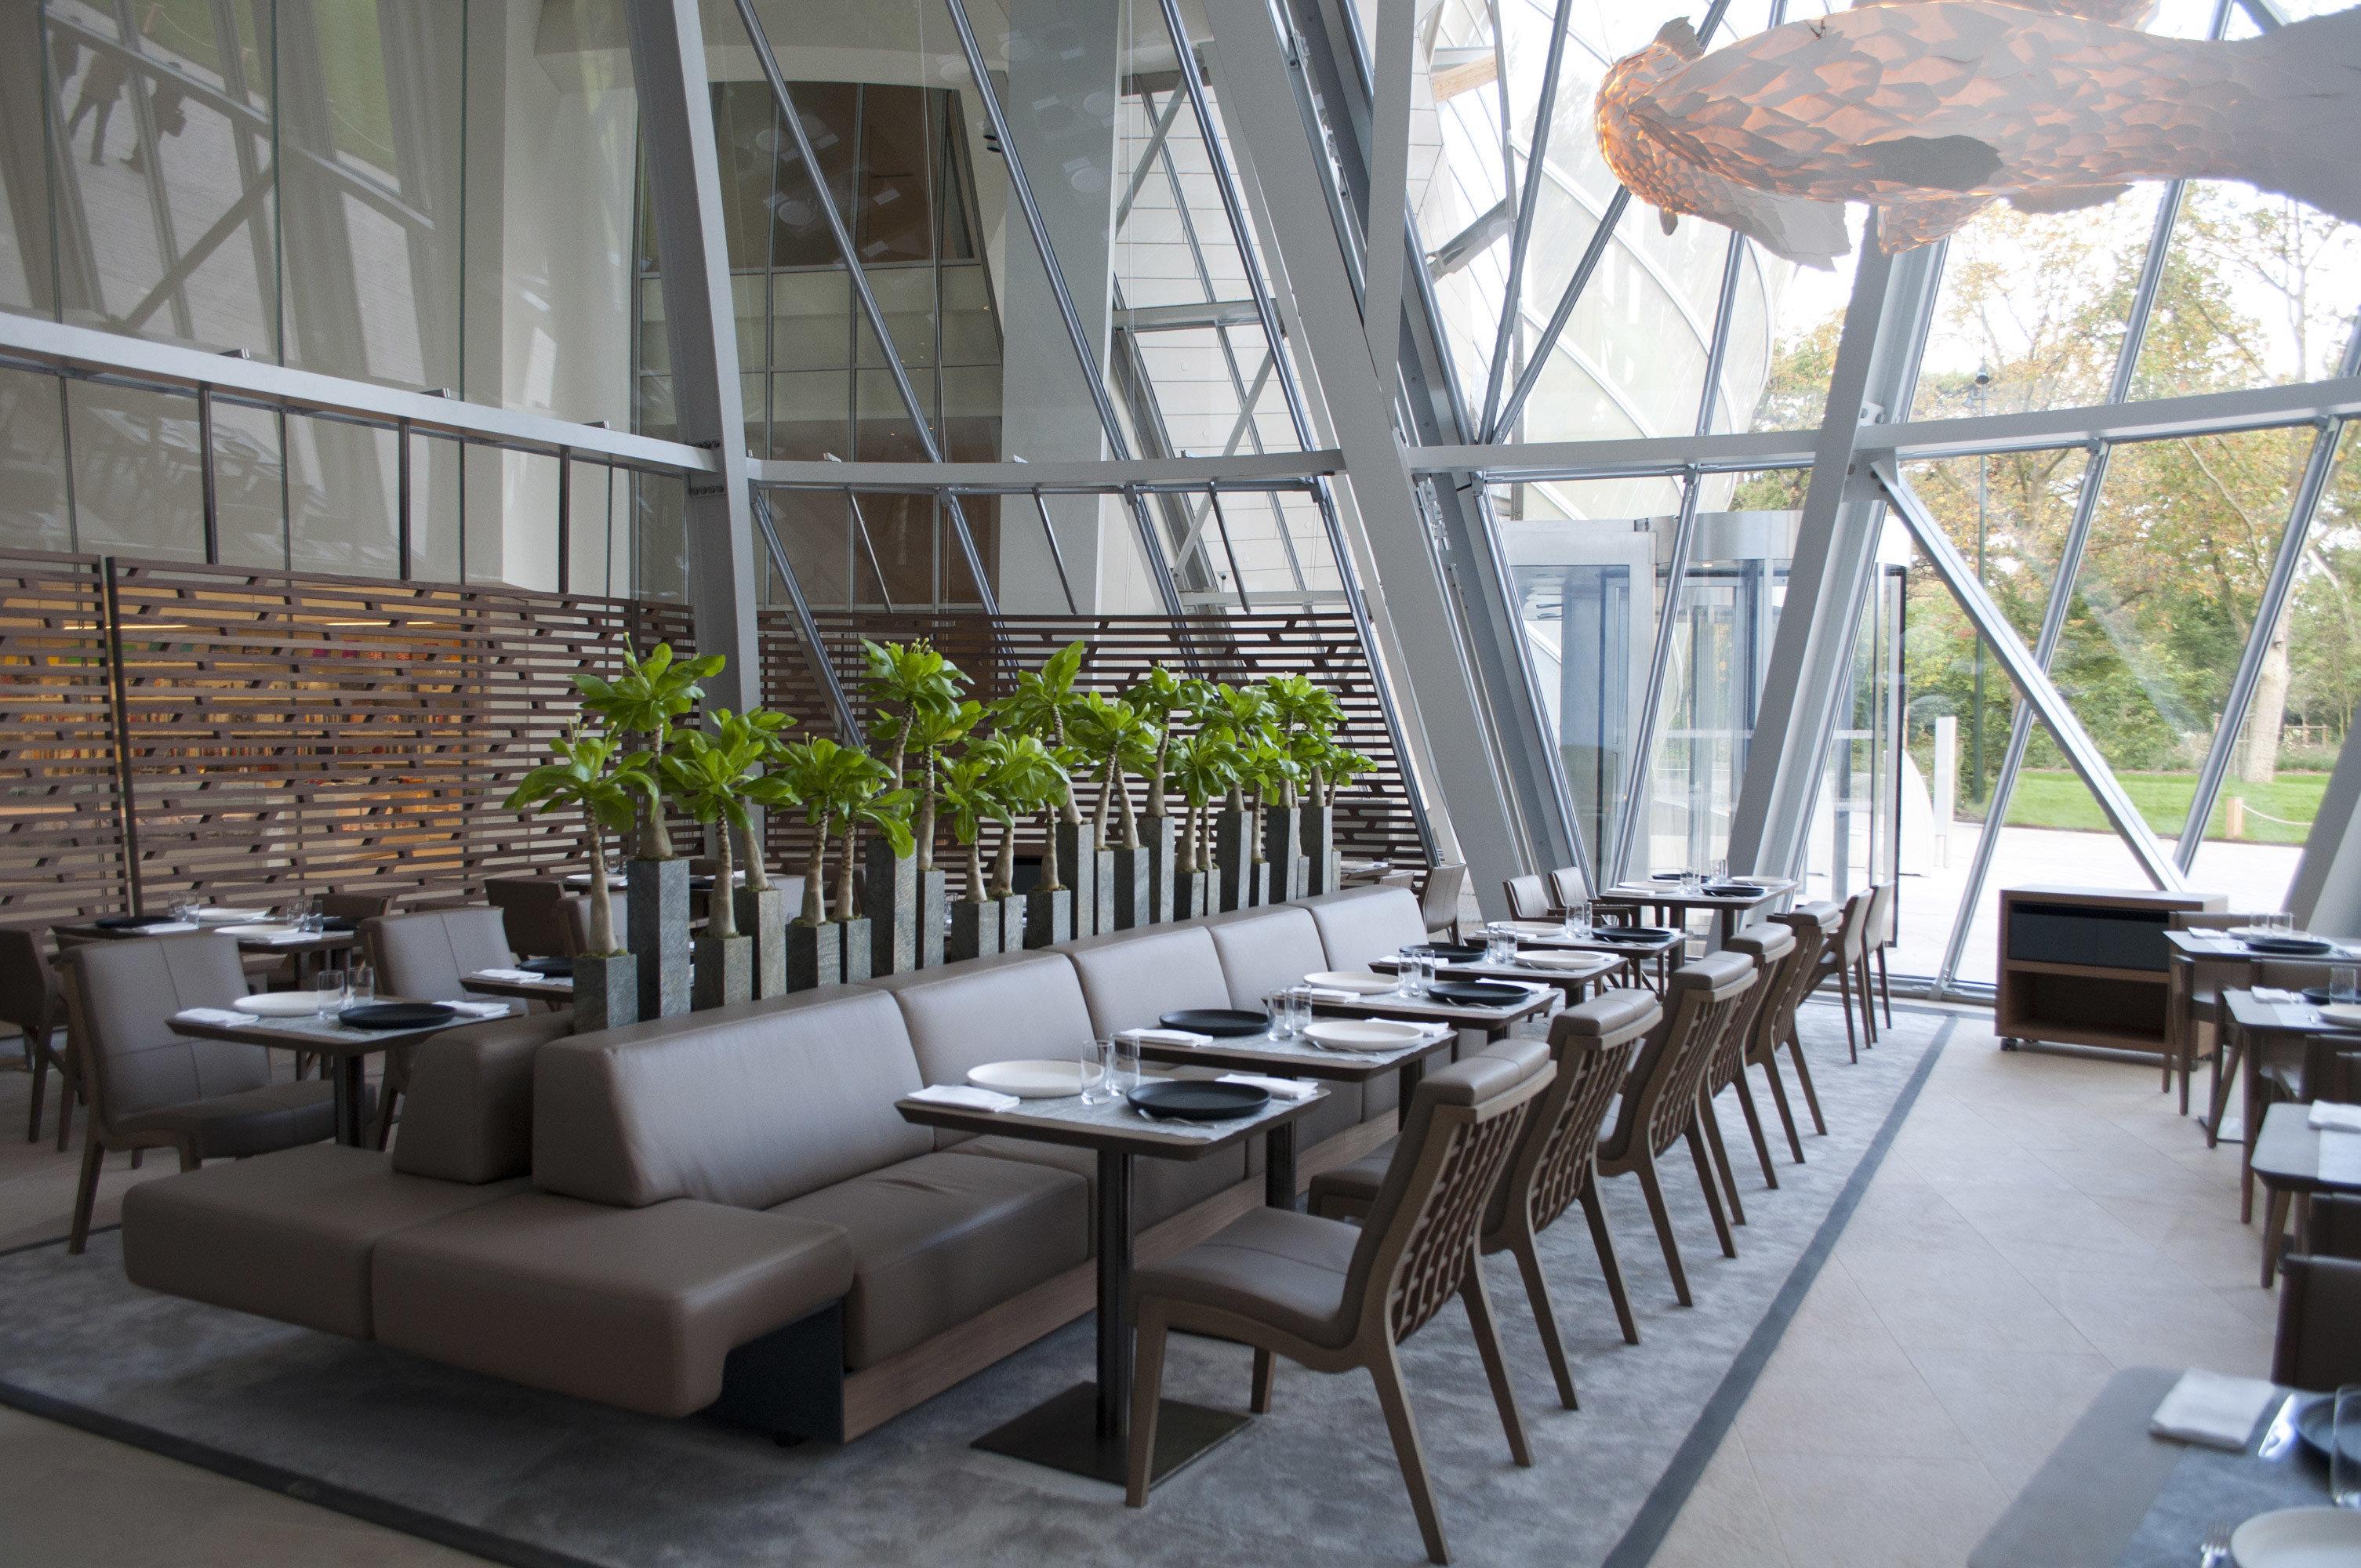 Food + Drink floor indoor room restaurant interior design Design estate table outdoor structure furniture